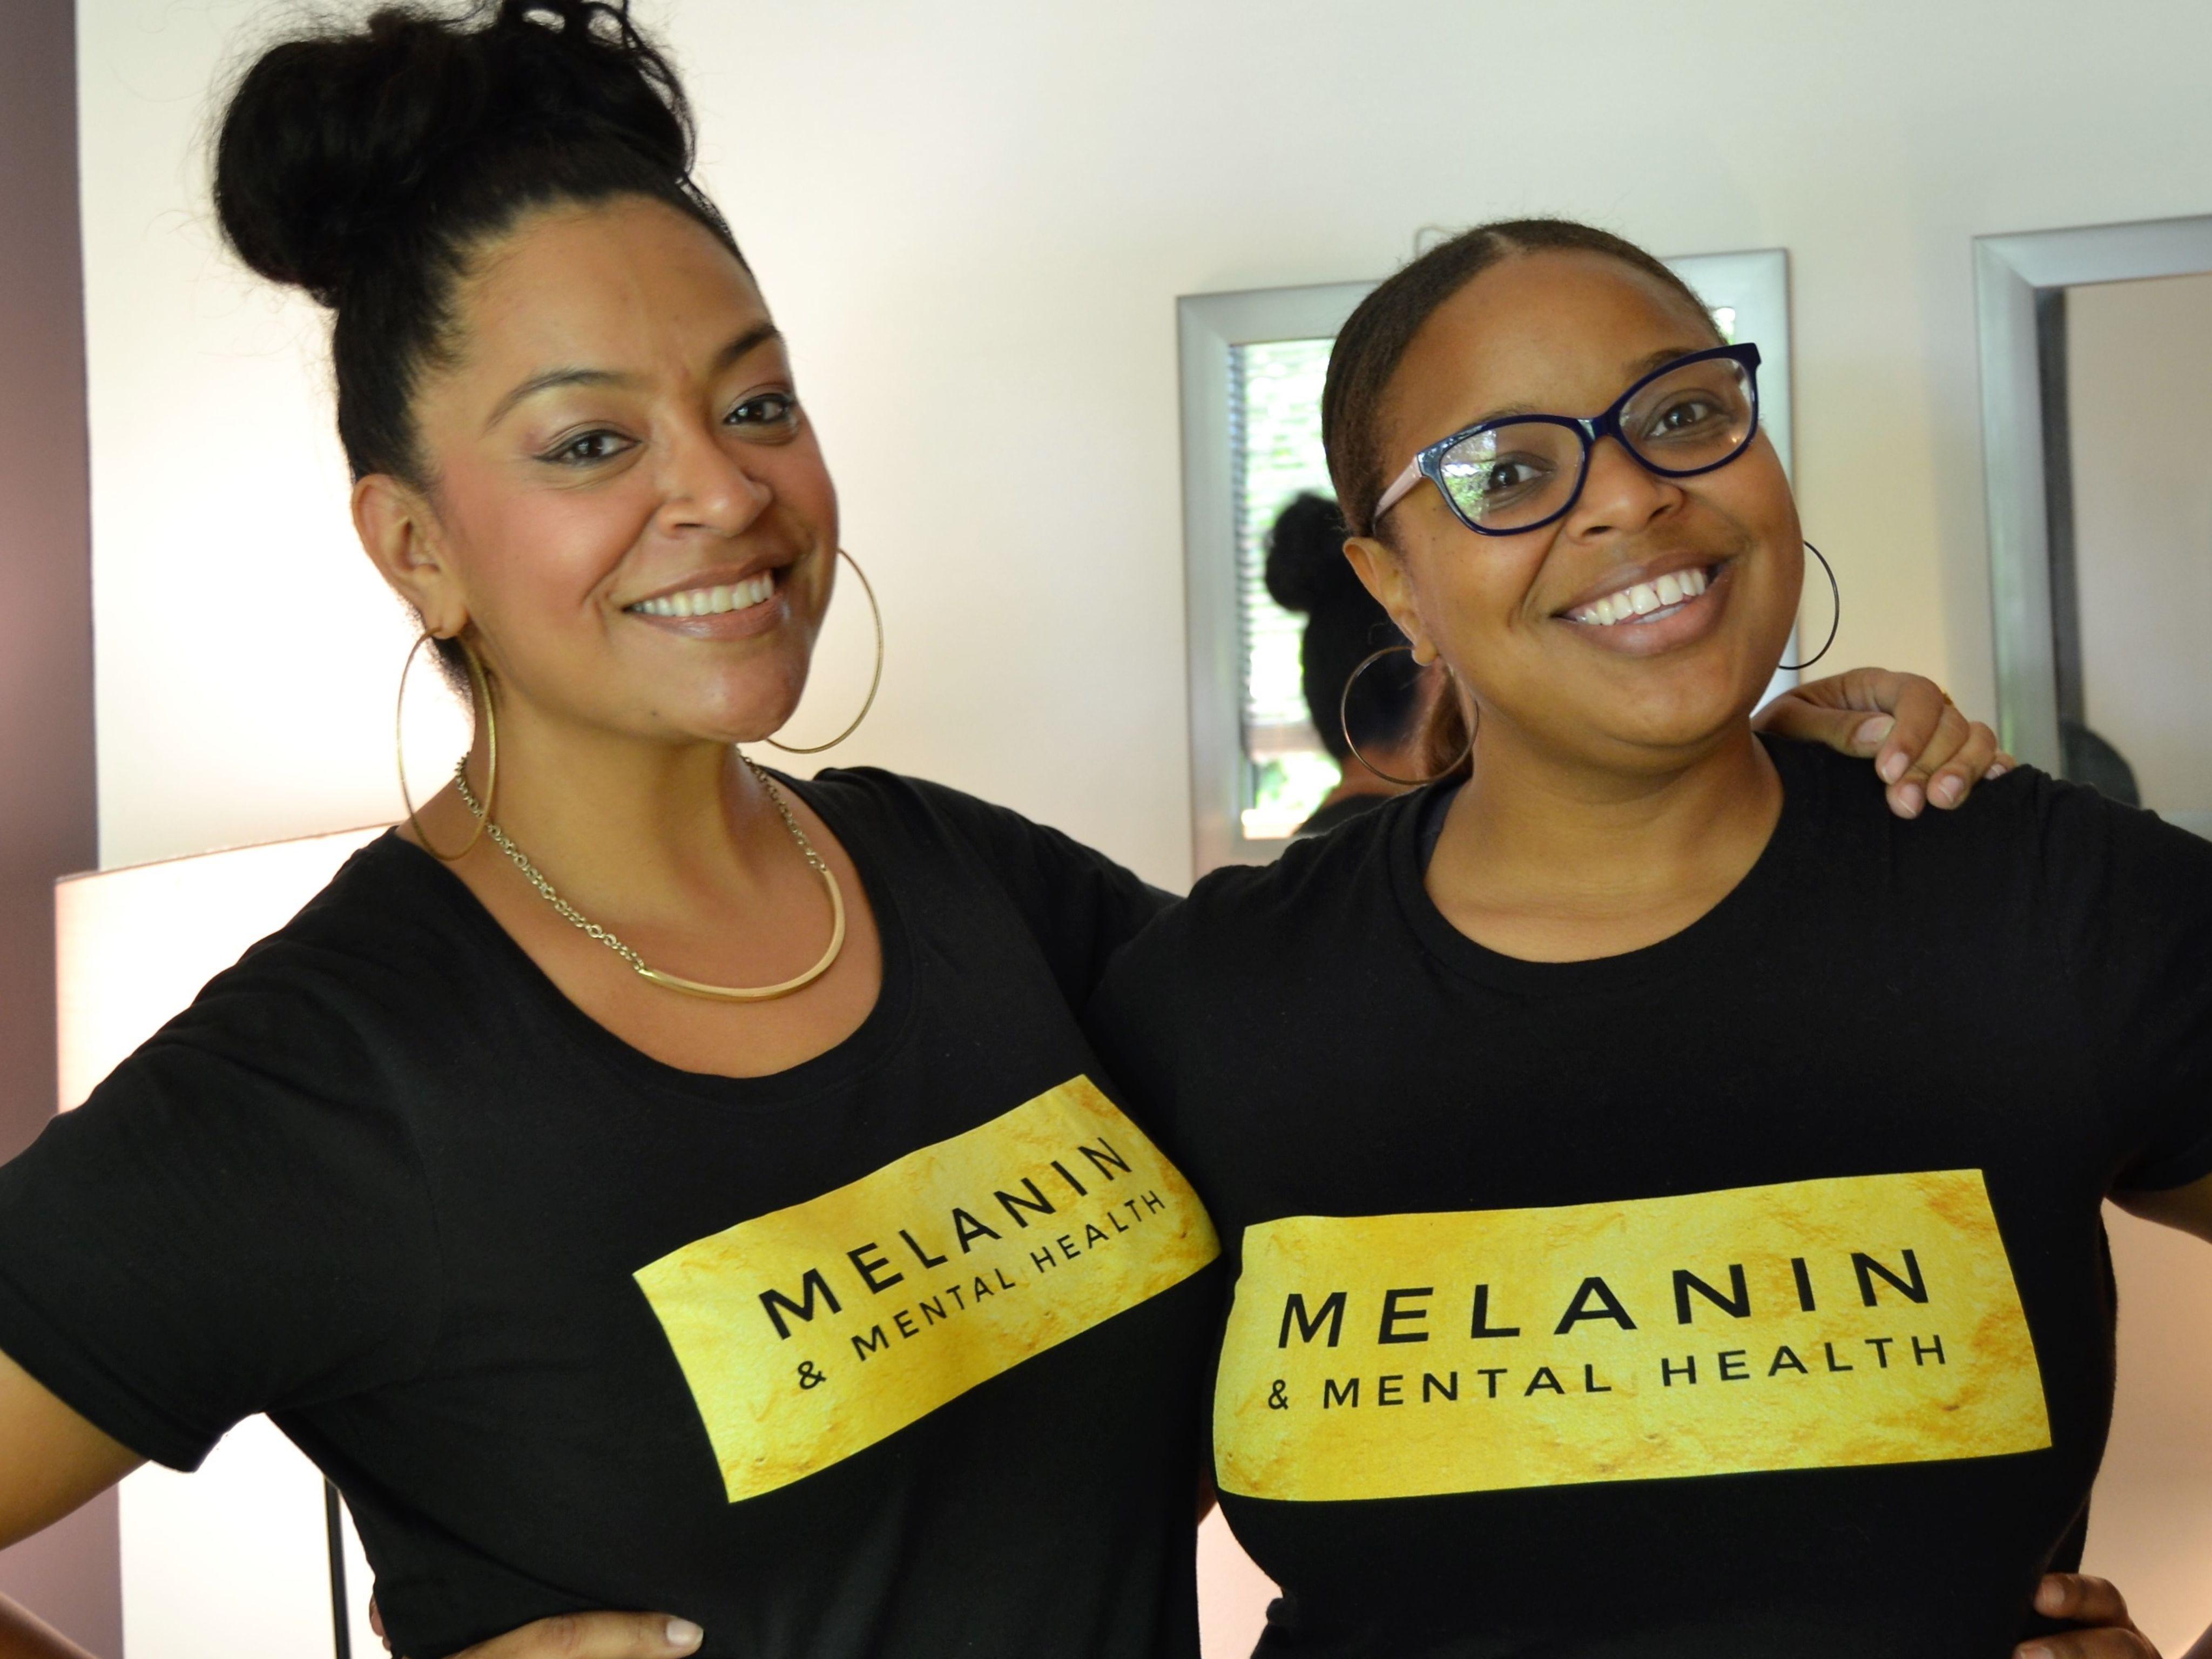 Melanin and mental health1 piwg7f